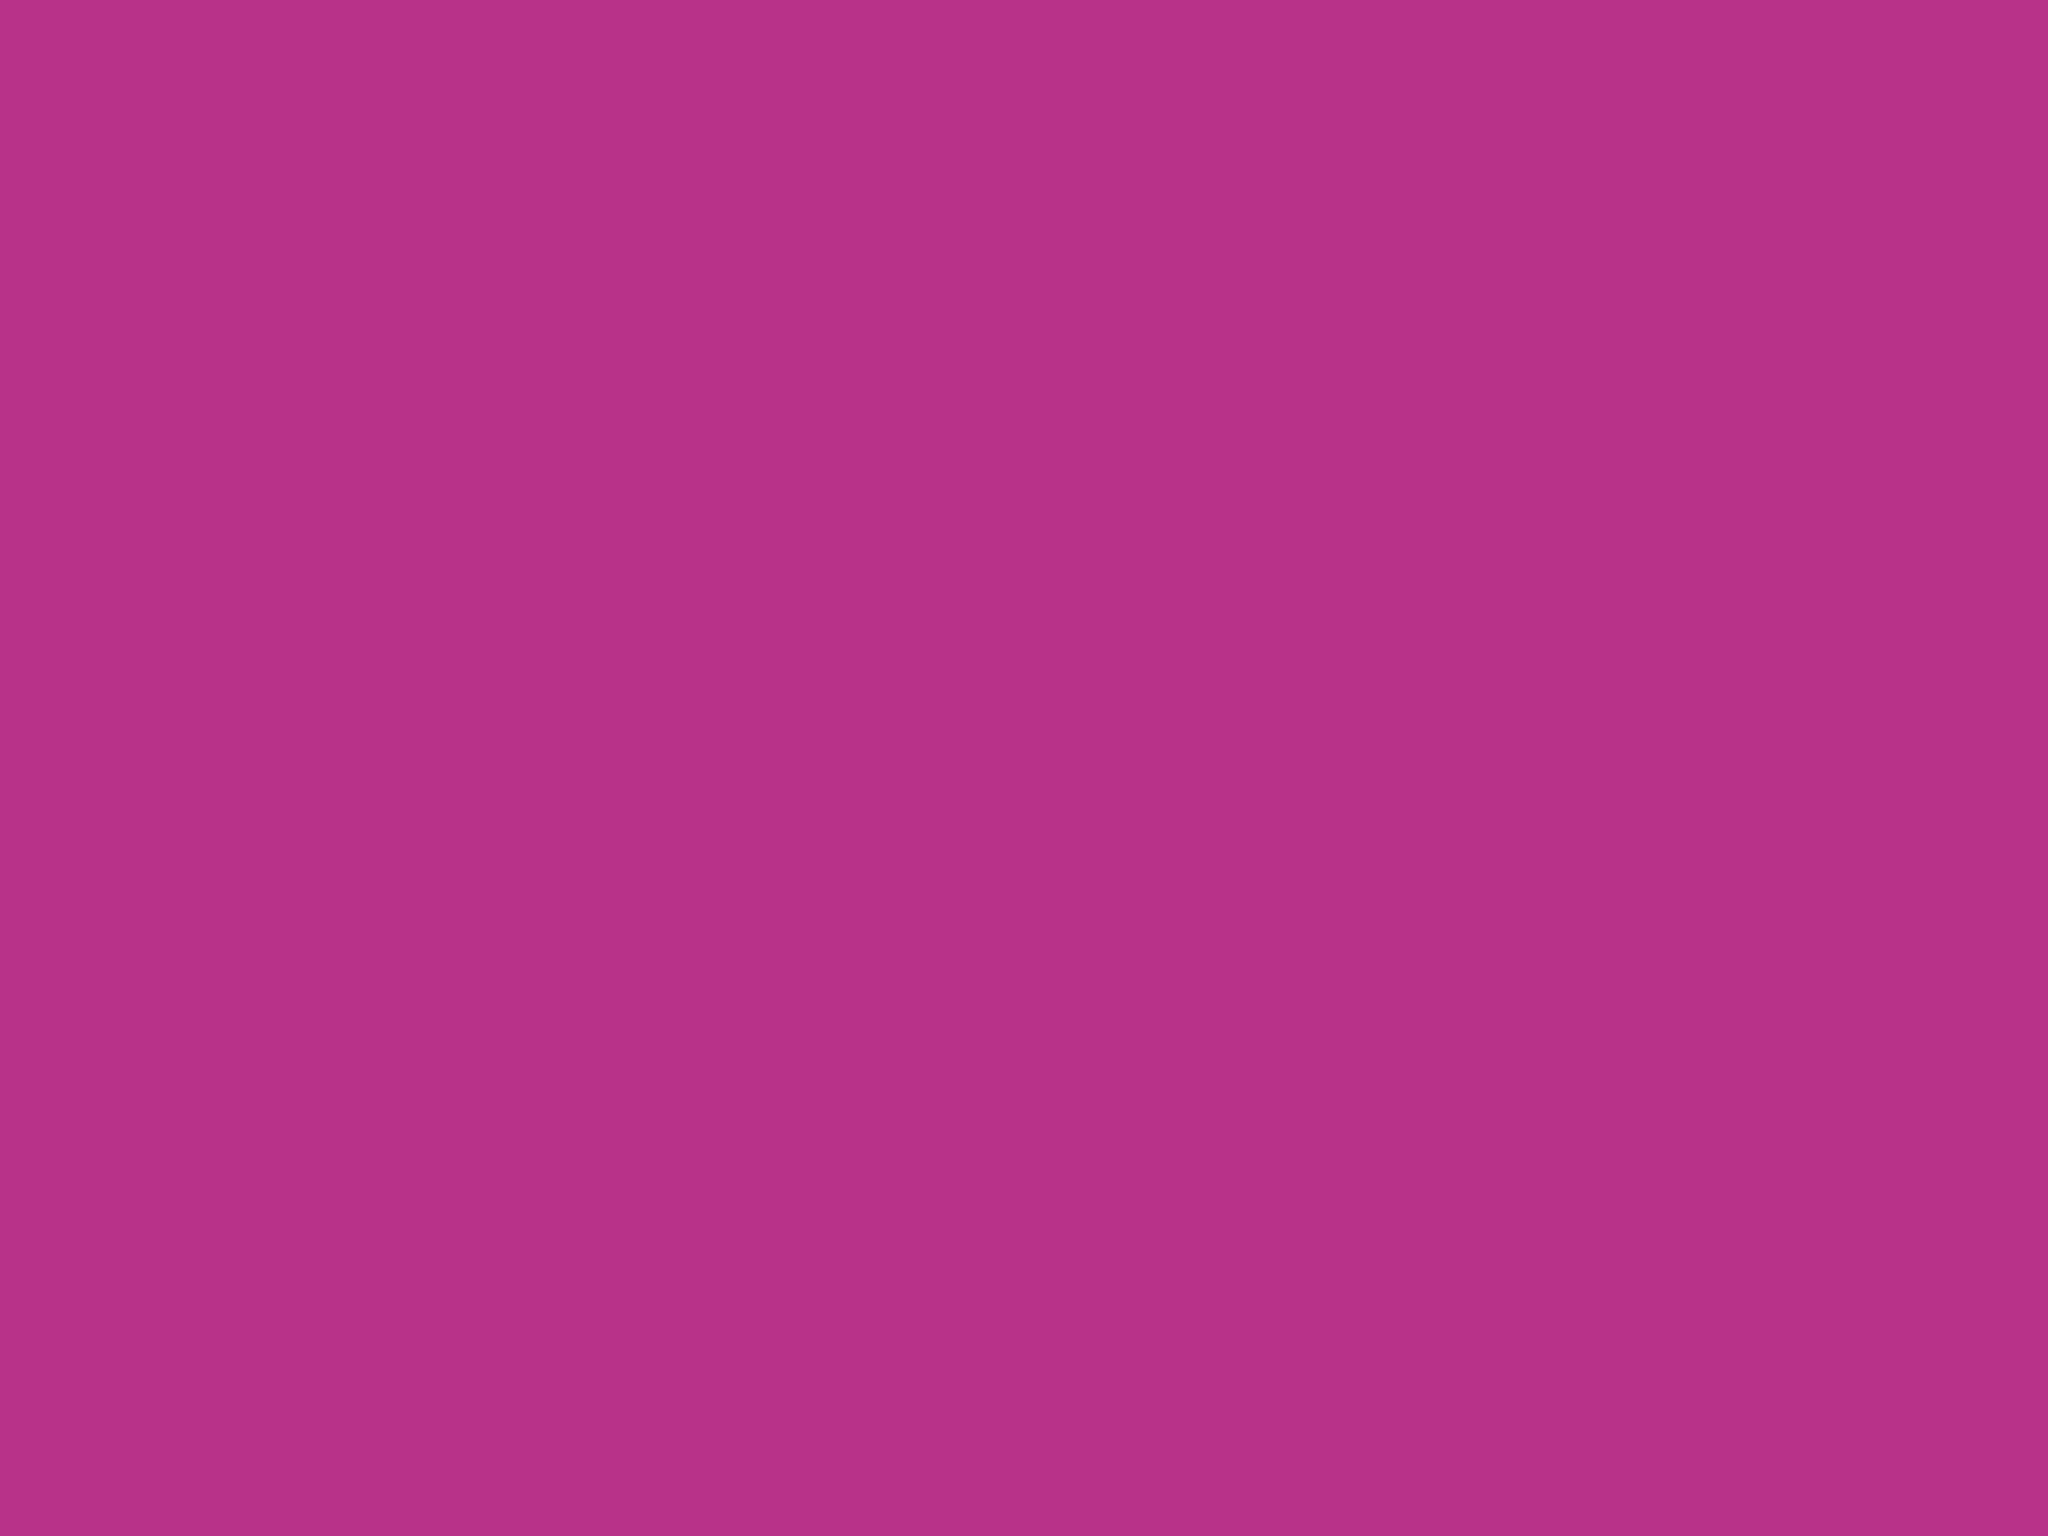 2048x1536 Fandango Solid Color Background